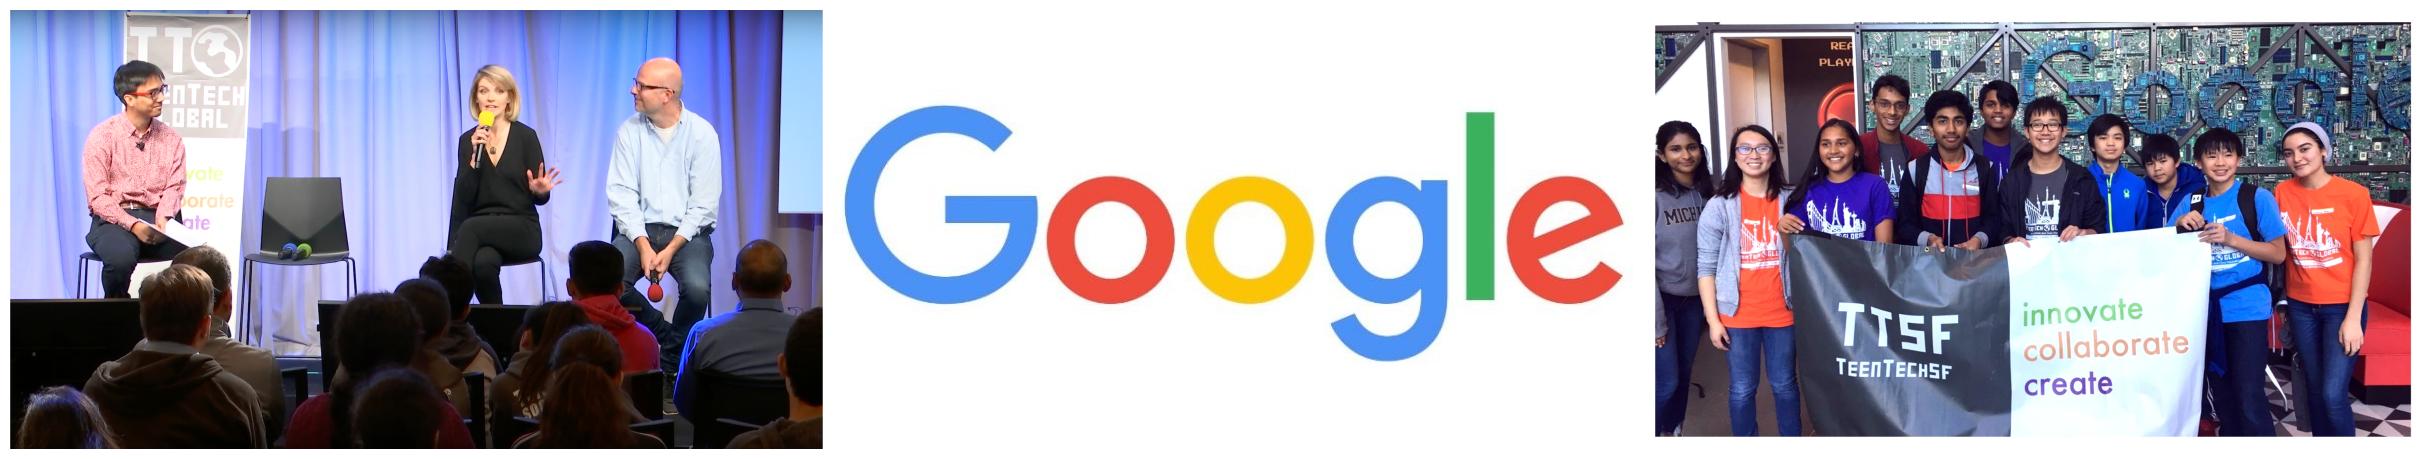 google katja marc wouter leadership website.jpg